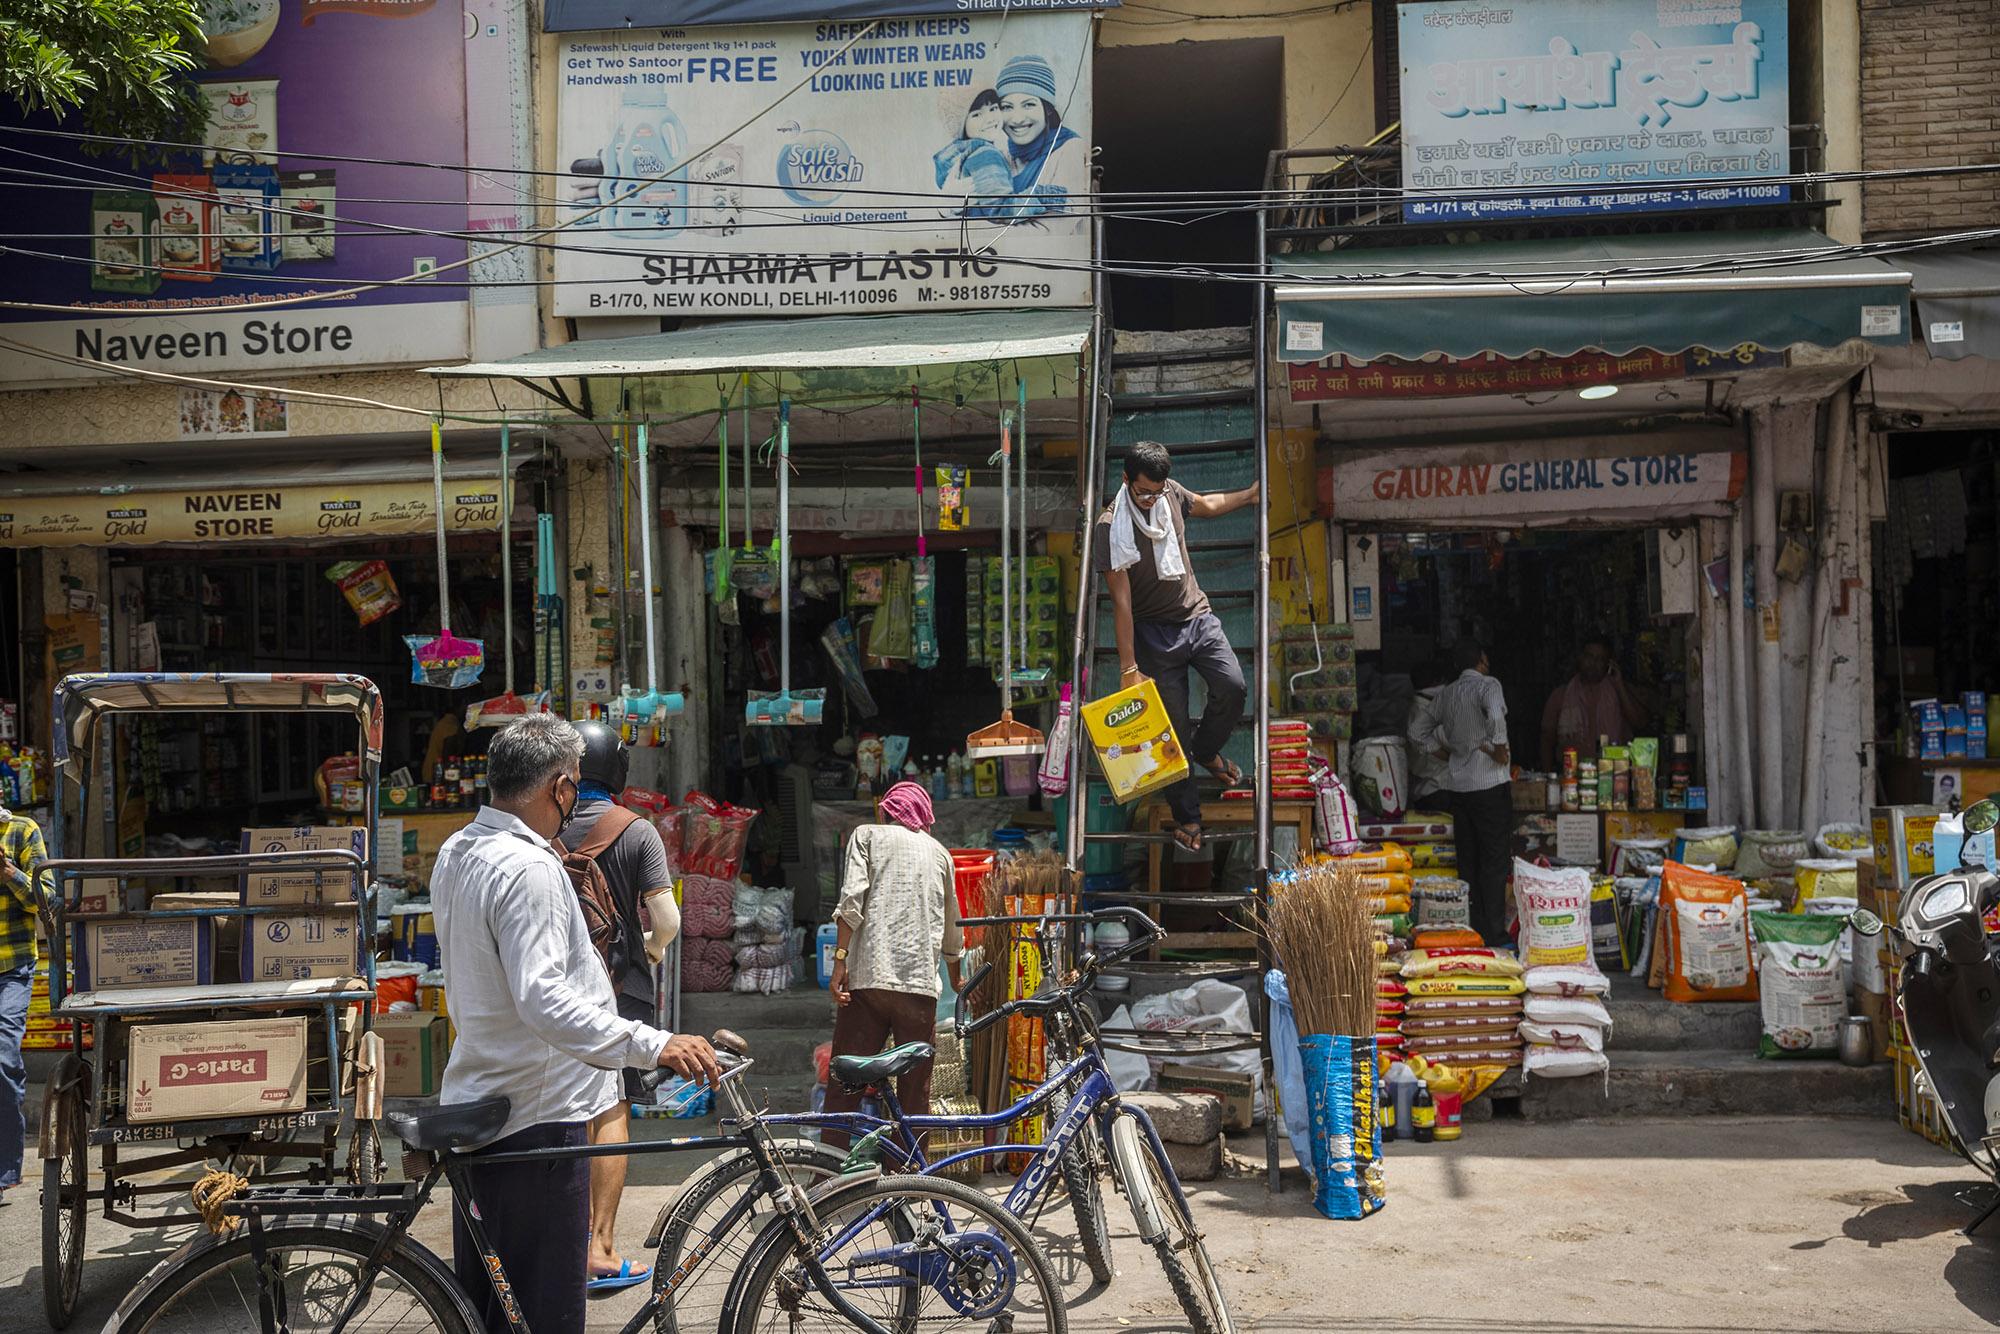 People shop at stores in Noida, Uttar Pradesh.